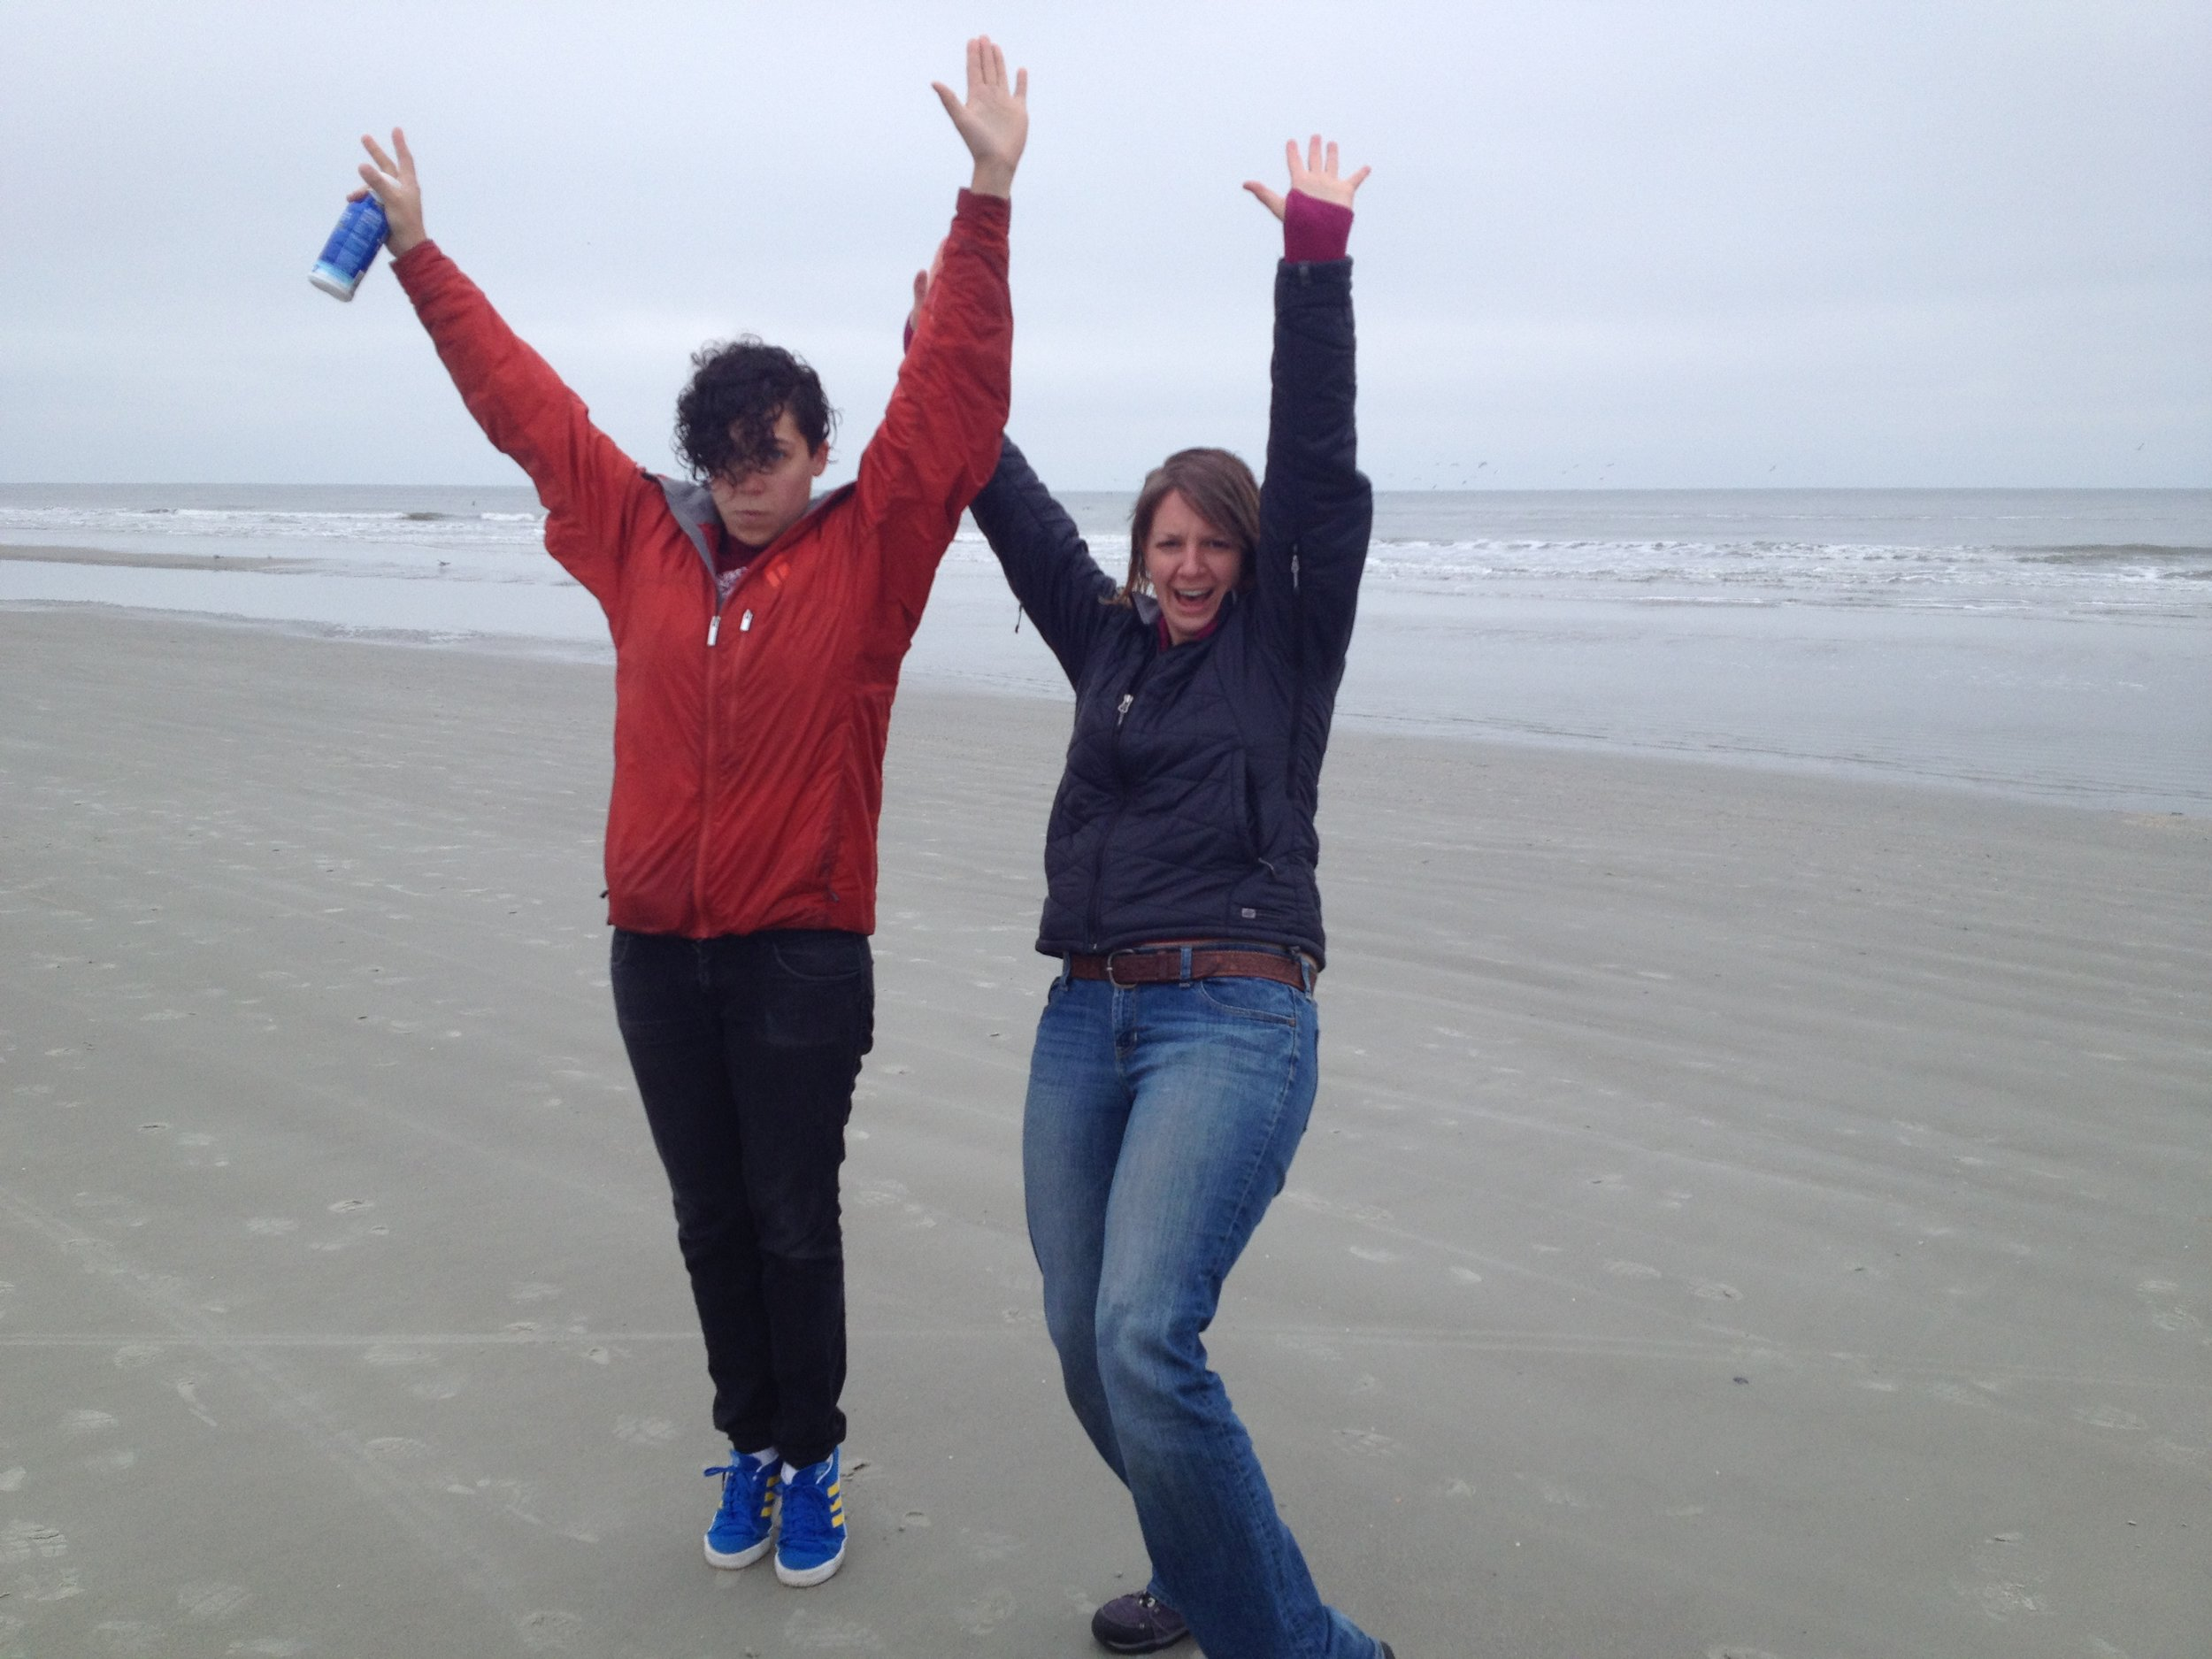 Manifesting our lives on the beach on Hilton Head Island, SC.